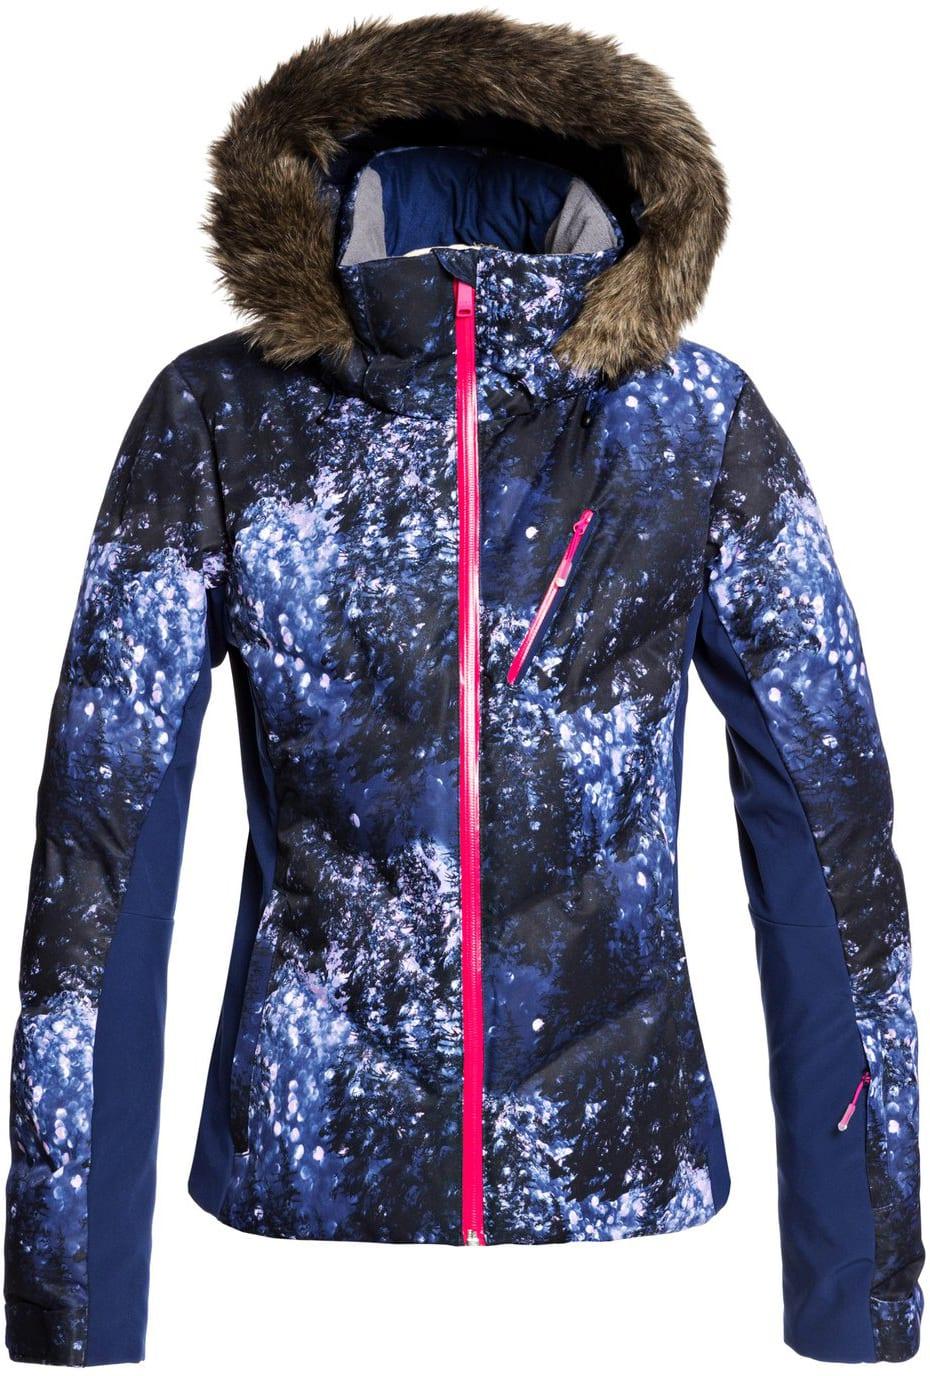 Roxy Snowstorm Plus Snowboard Jacket Womens 2020